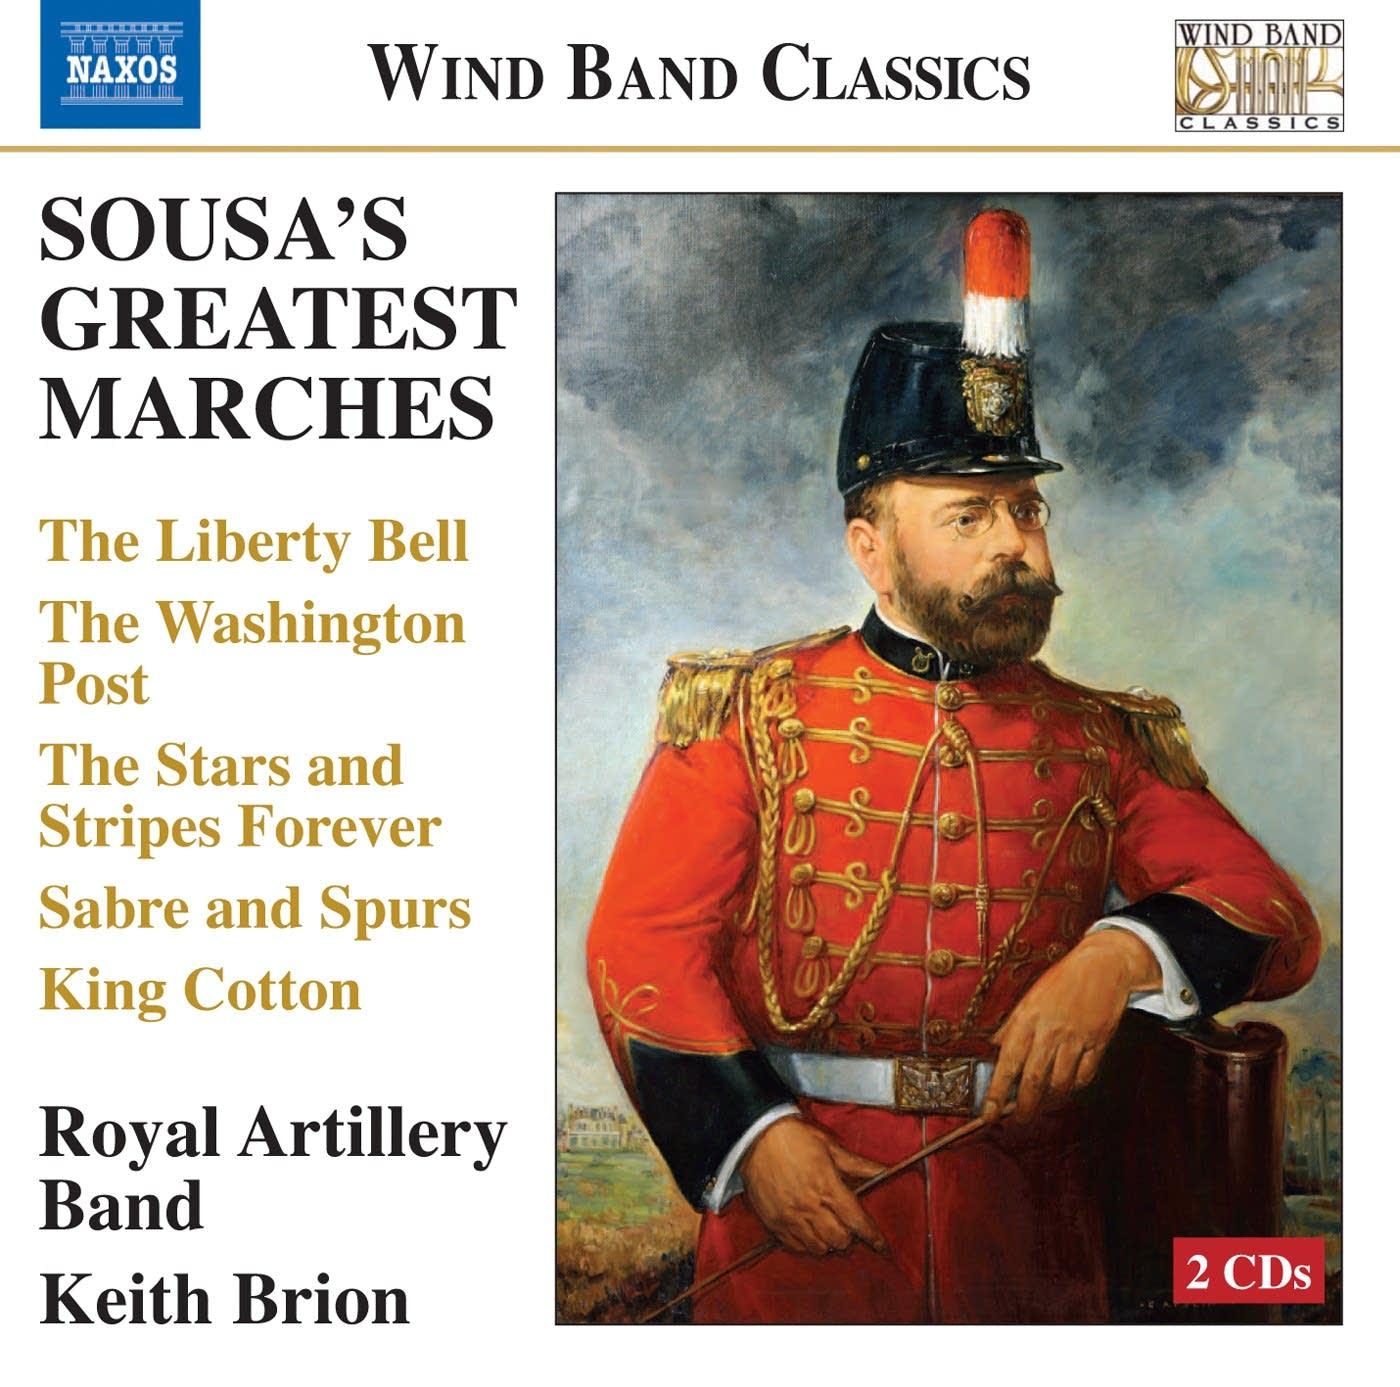 John Philip Sousa - The Washington Post March